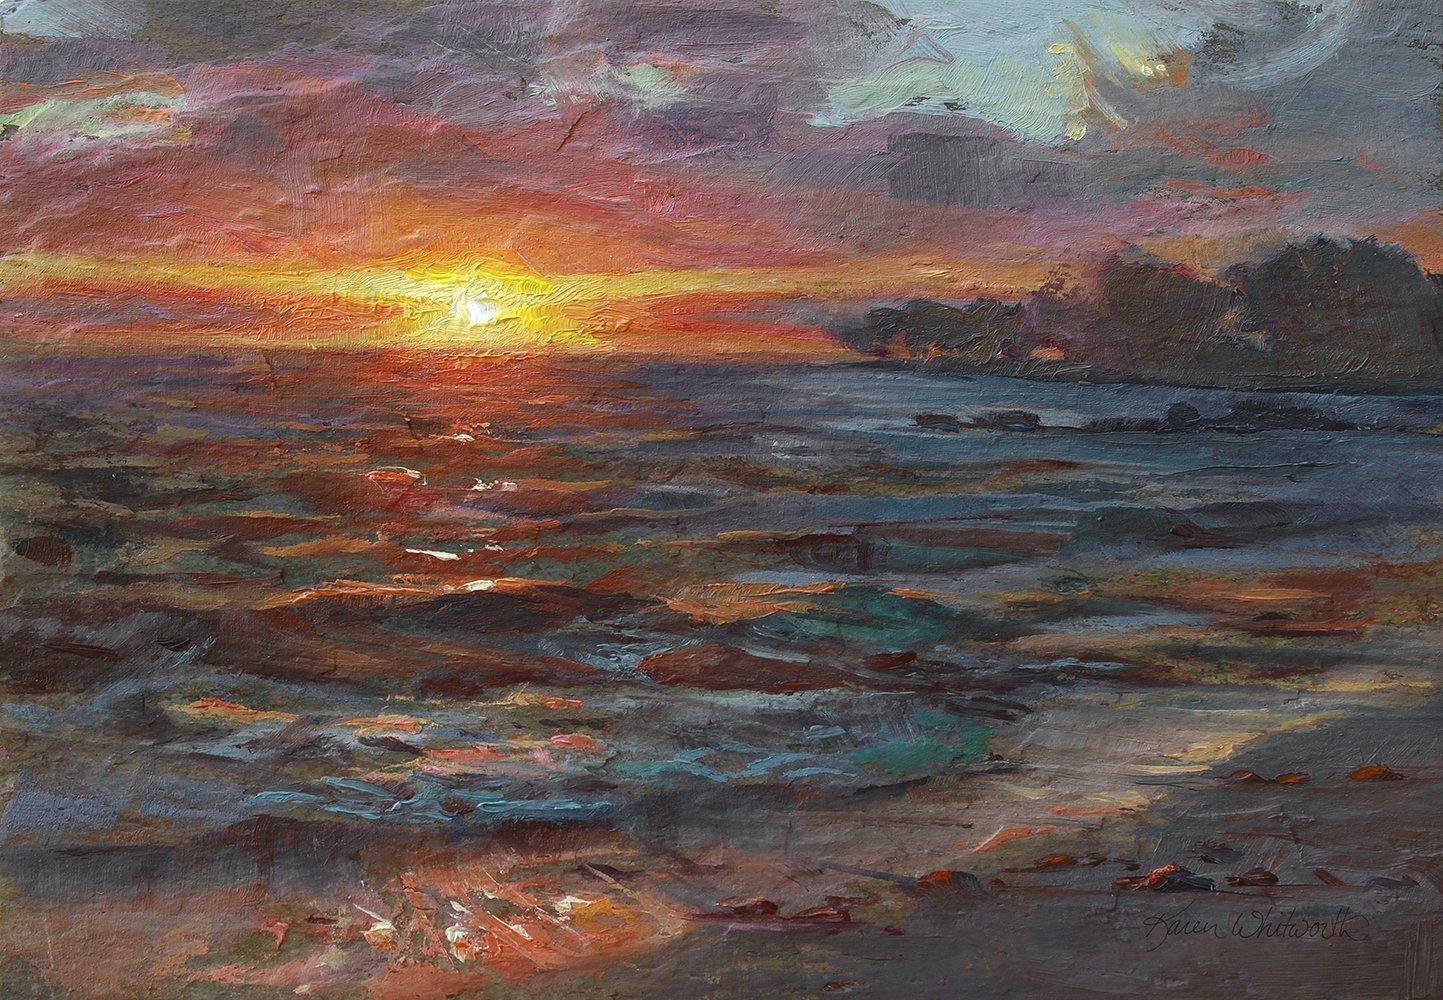 Hawaii Beach Landscape Sunset Art Print - Kona Waves and Ocean Tropical Painting by Karen Whitworth